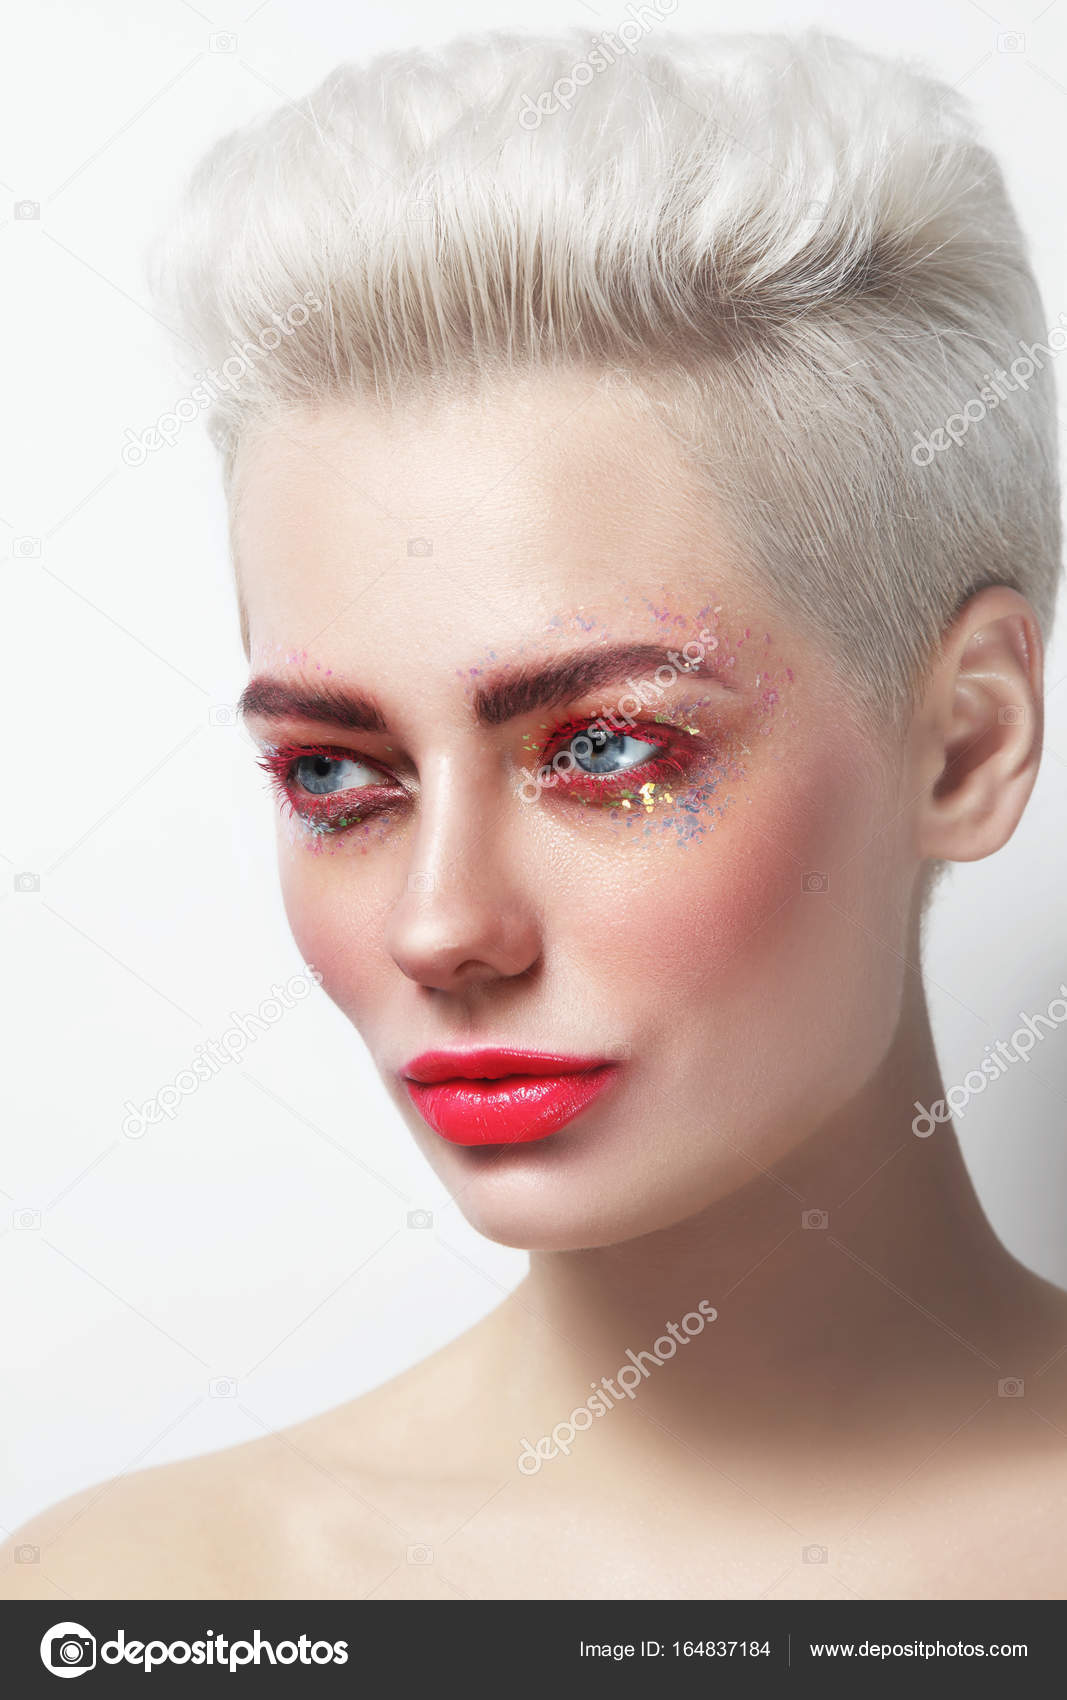 belle blonde platine femme glamour — photographie pepperbox © #164837184